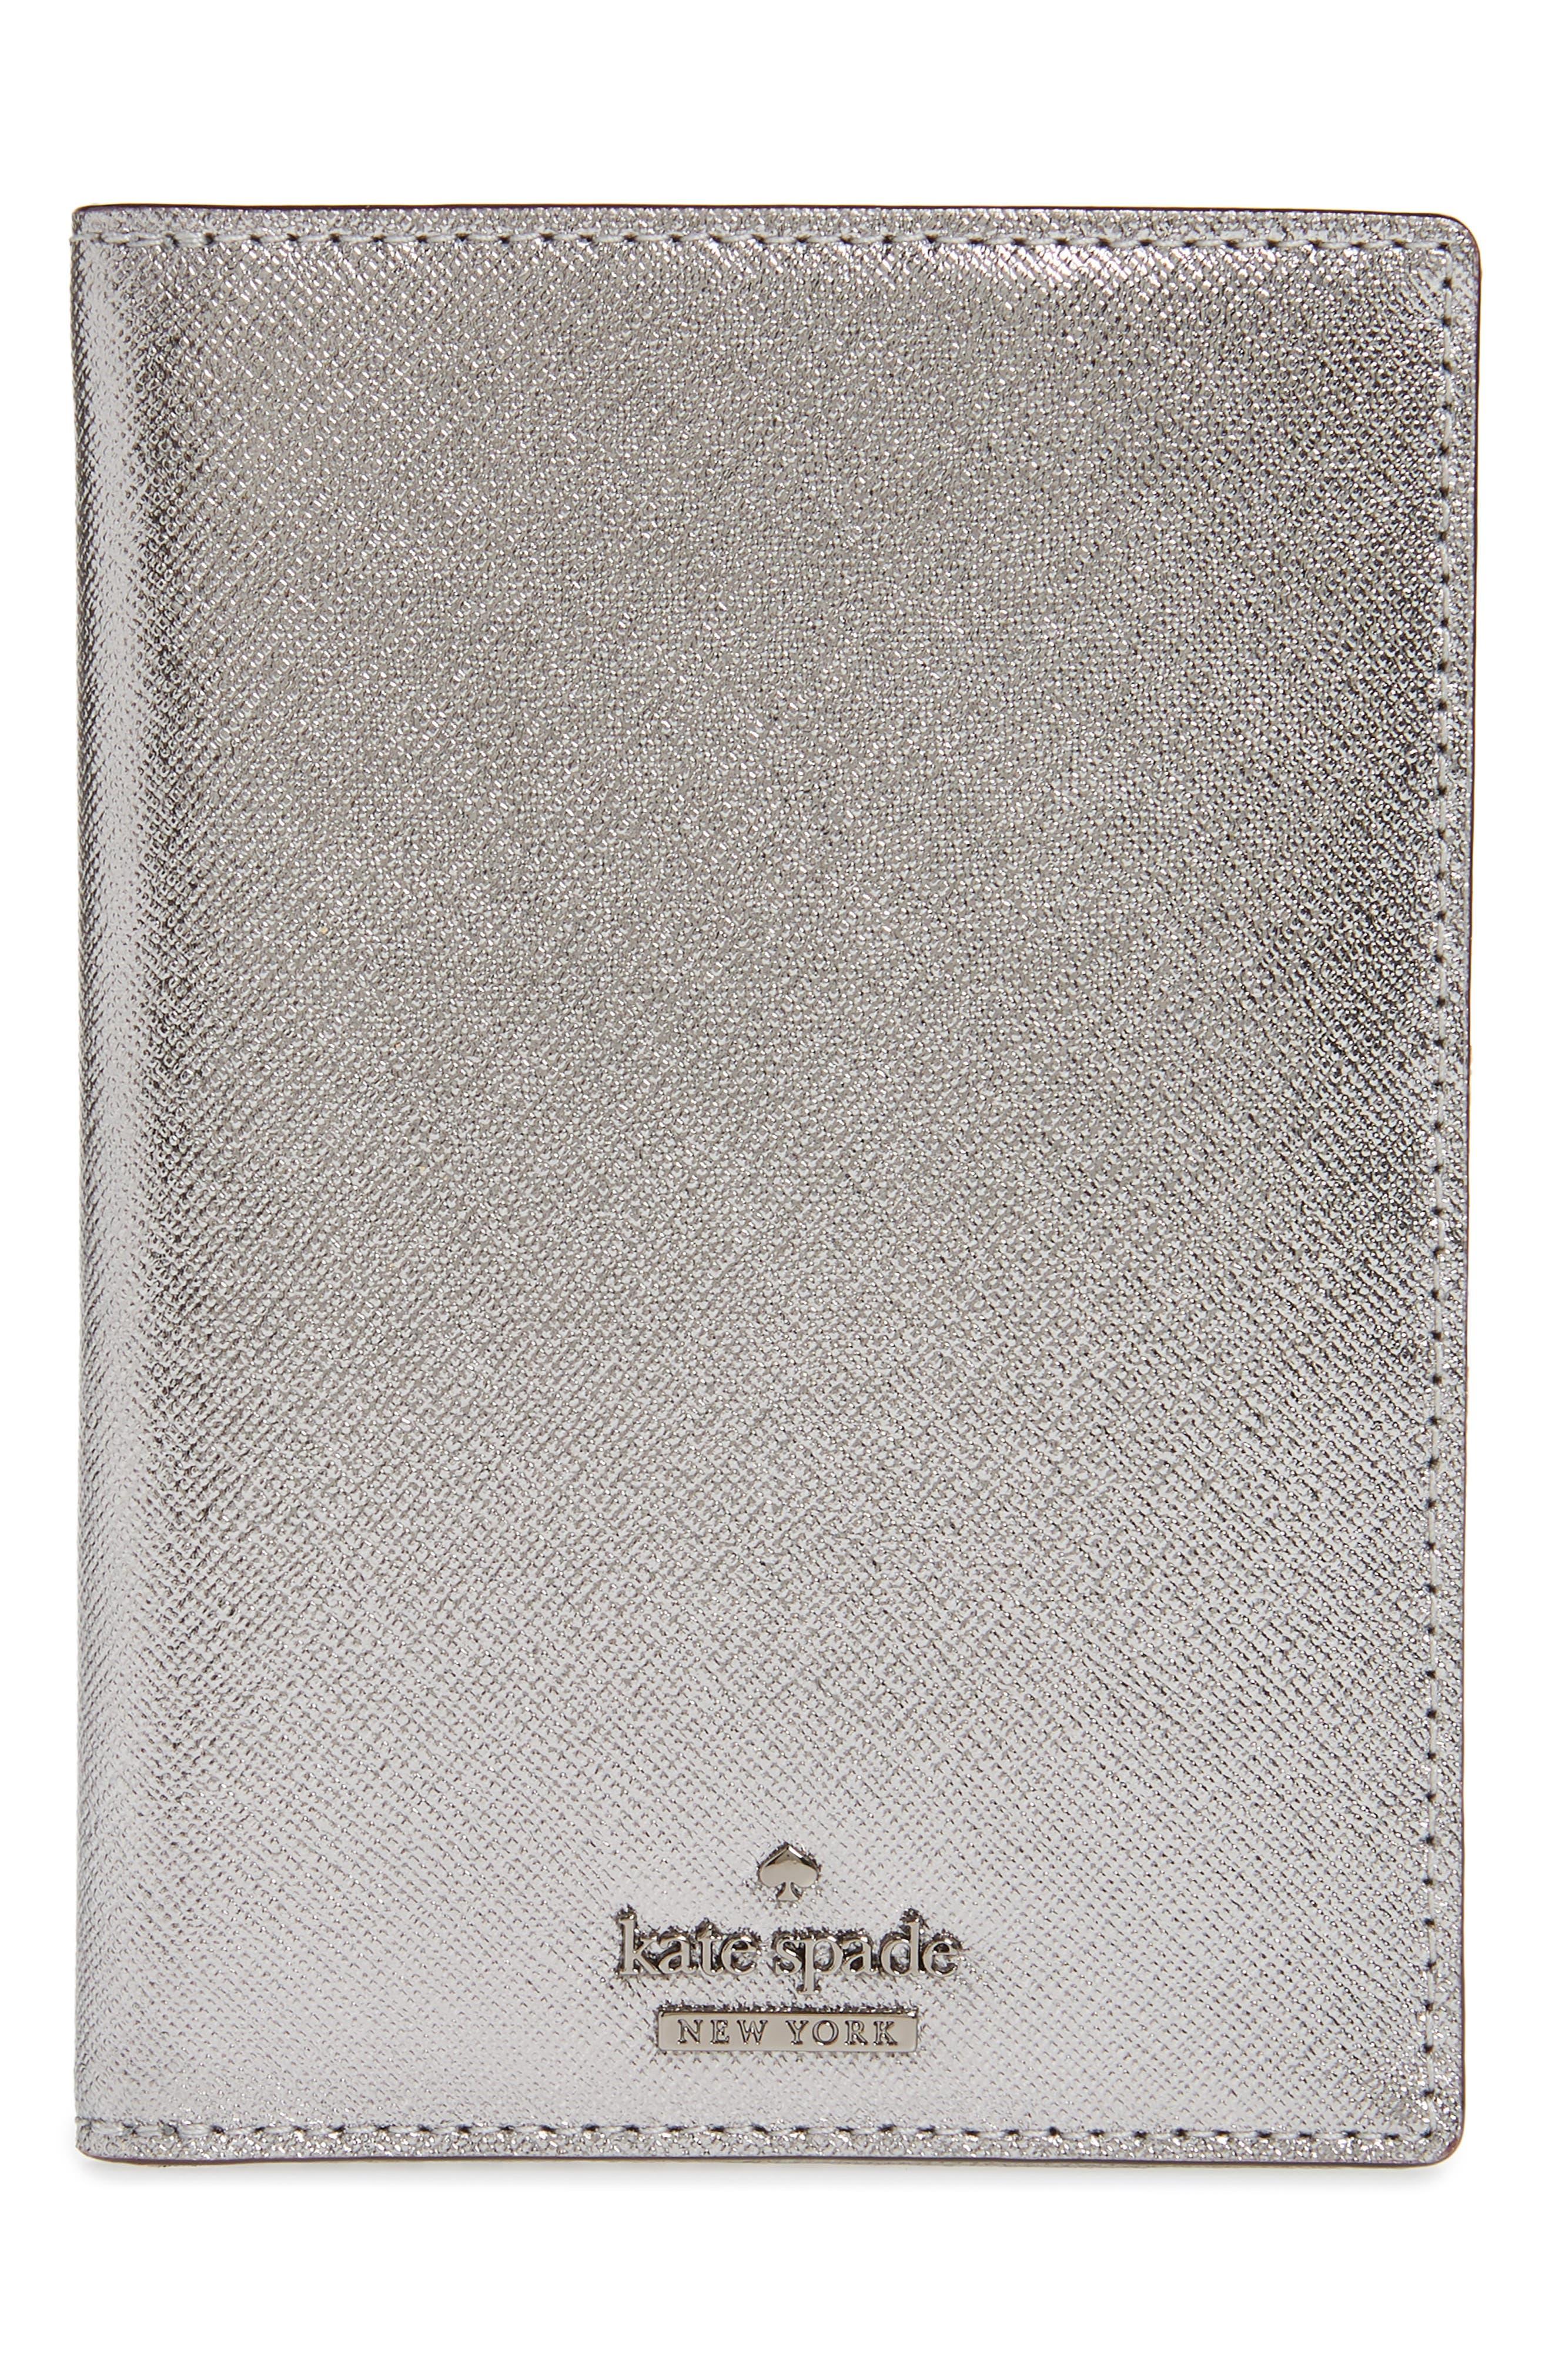 'cameron street' leather passport holder,                             Main thumbnail 1, color,                             040